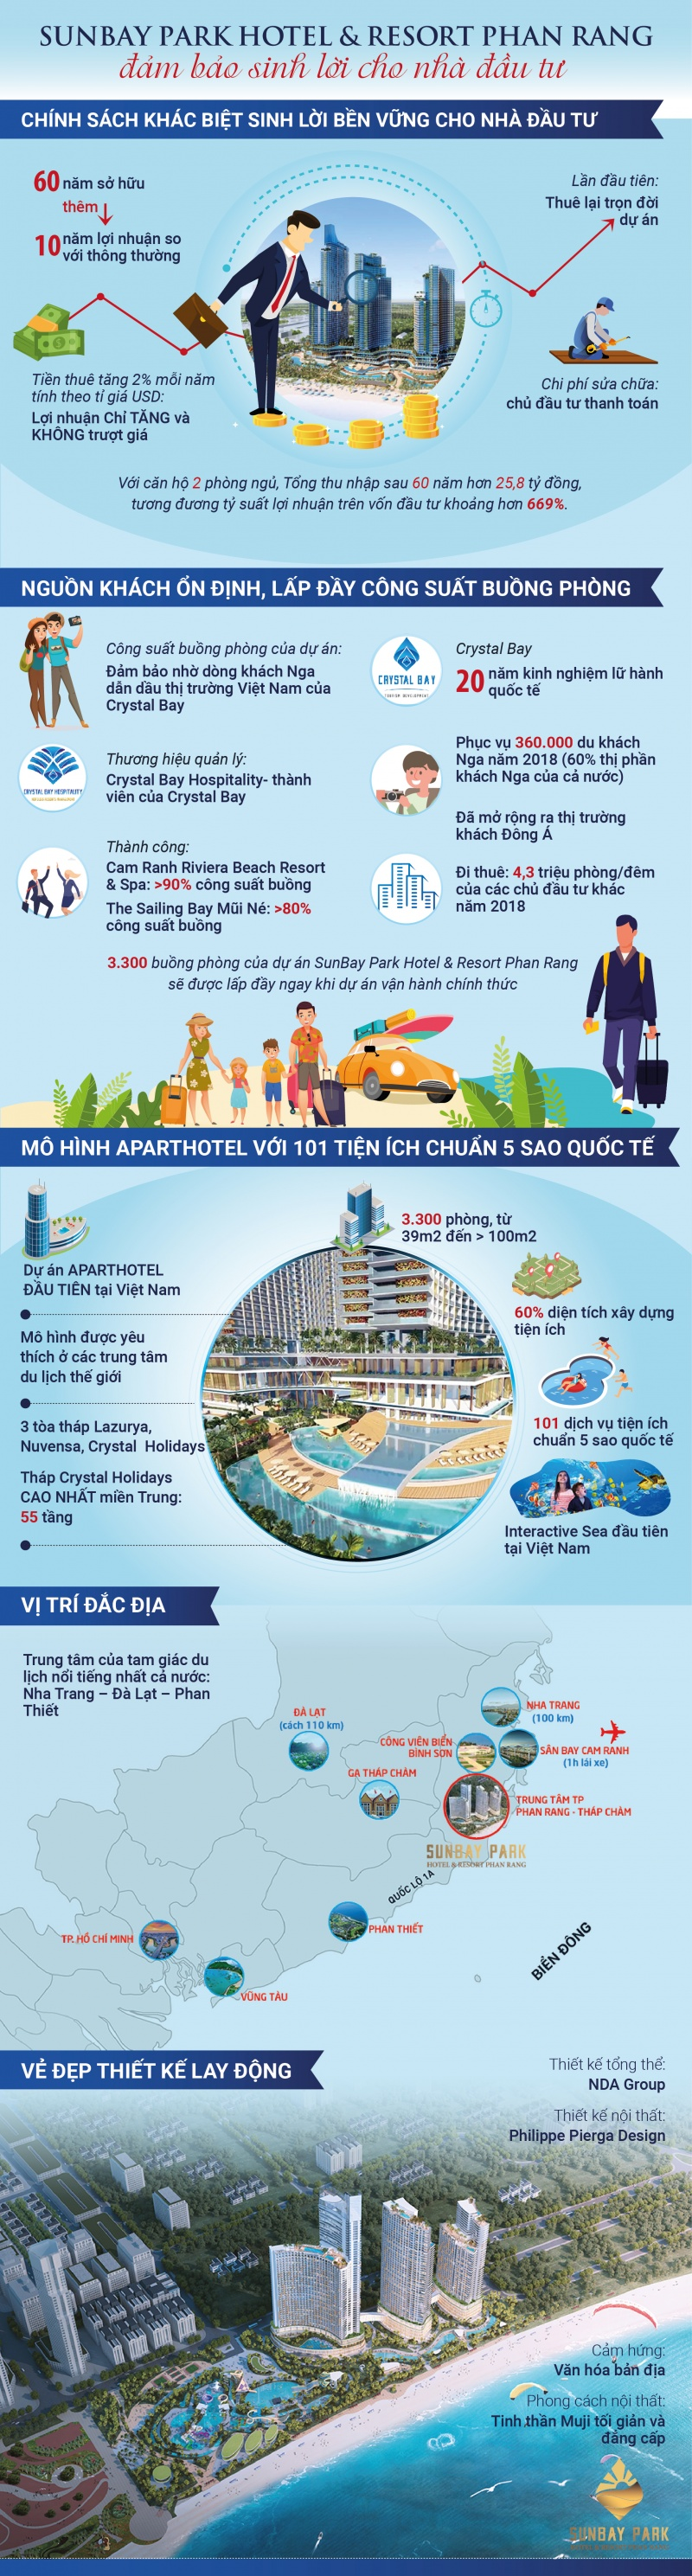 sunbay park hotel resort phan rang kenh dau tu sinh loi va tang ben vung